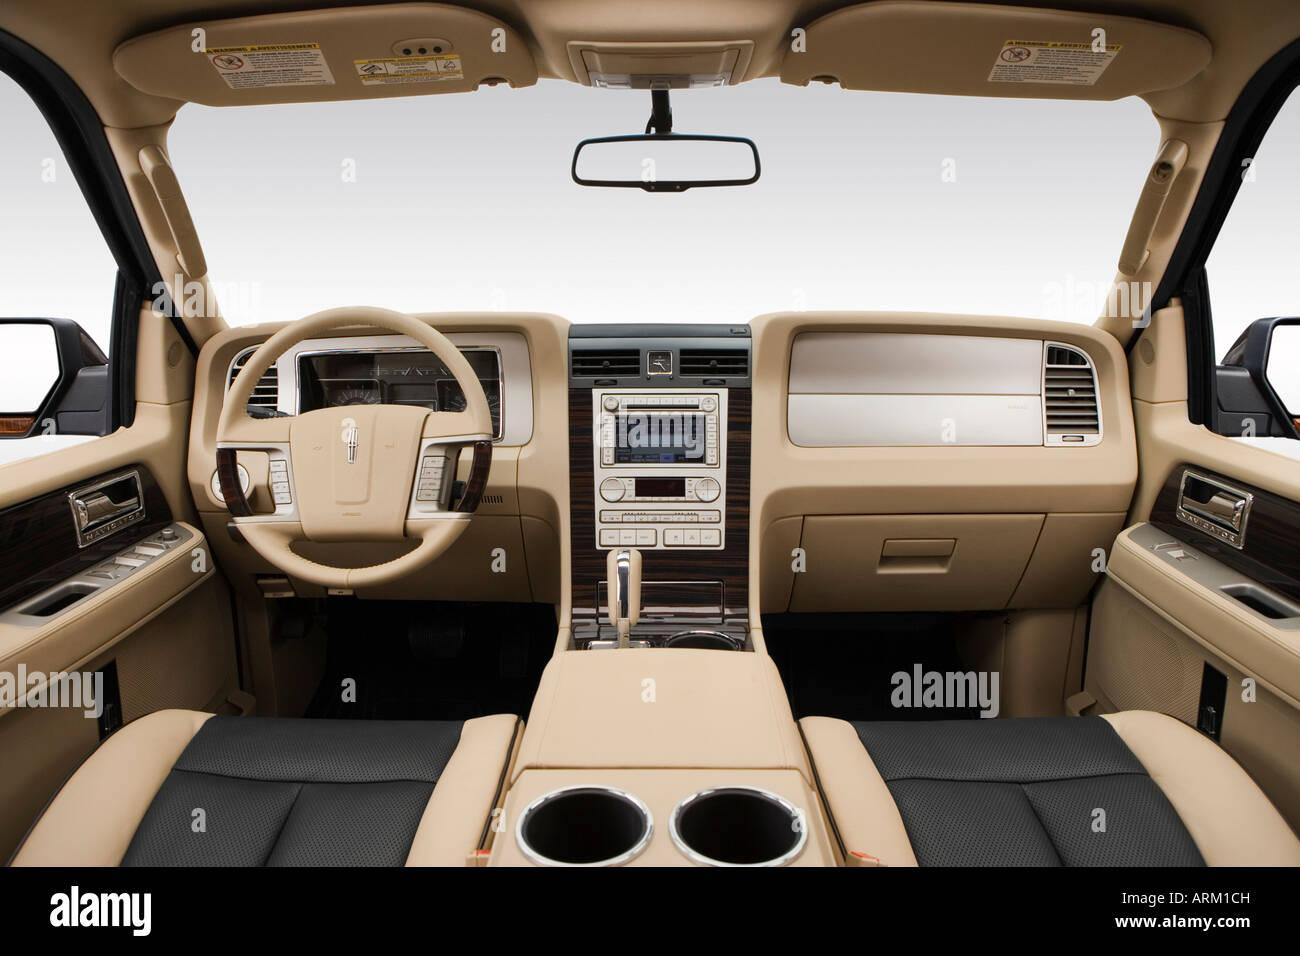 2008 lincoln navigator l in green dashboard center console gear shifter view